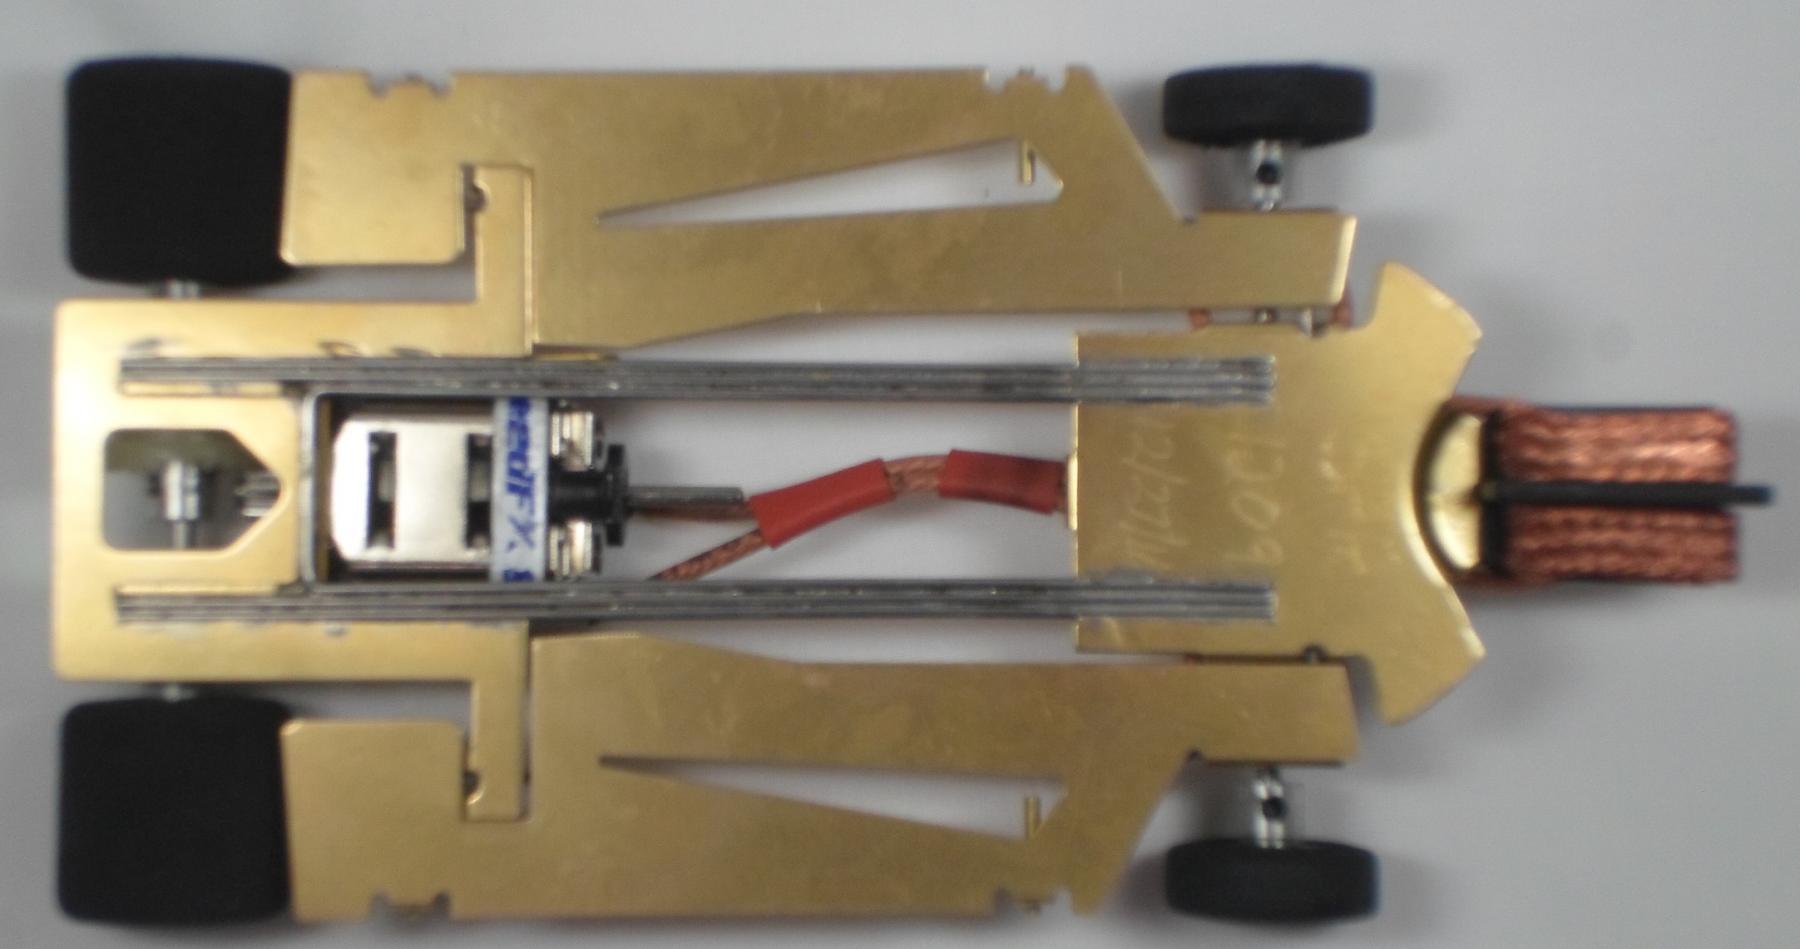 SPR1209 - Bottom.JPG